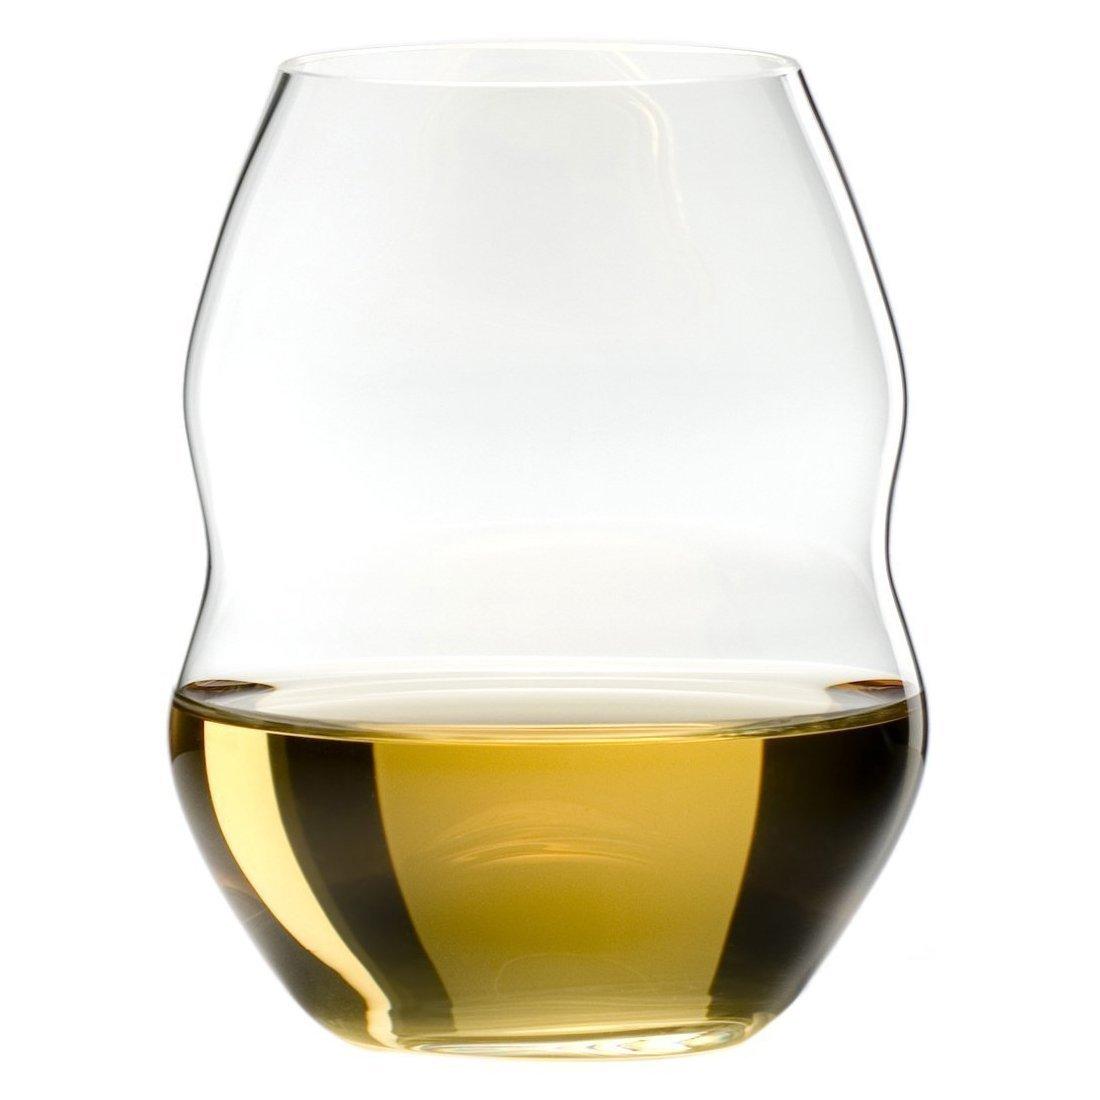 Riedel Swirl White Wine Glasses, Set of 4